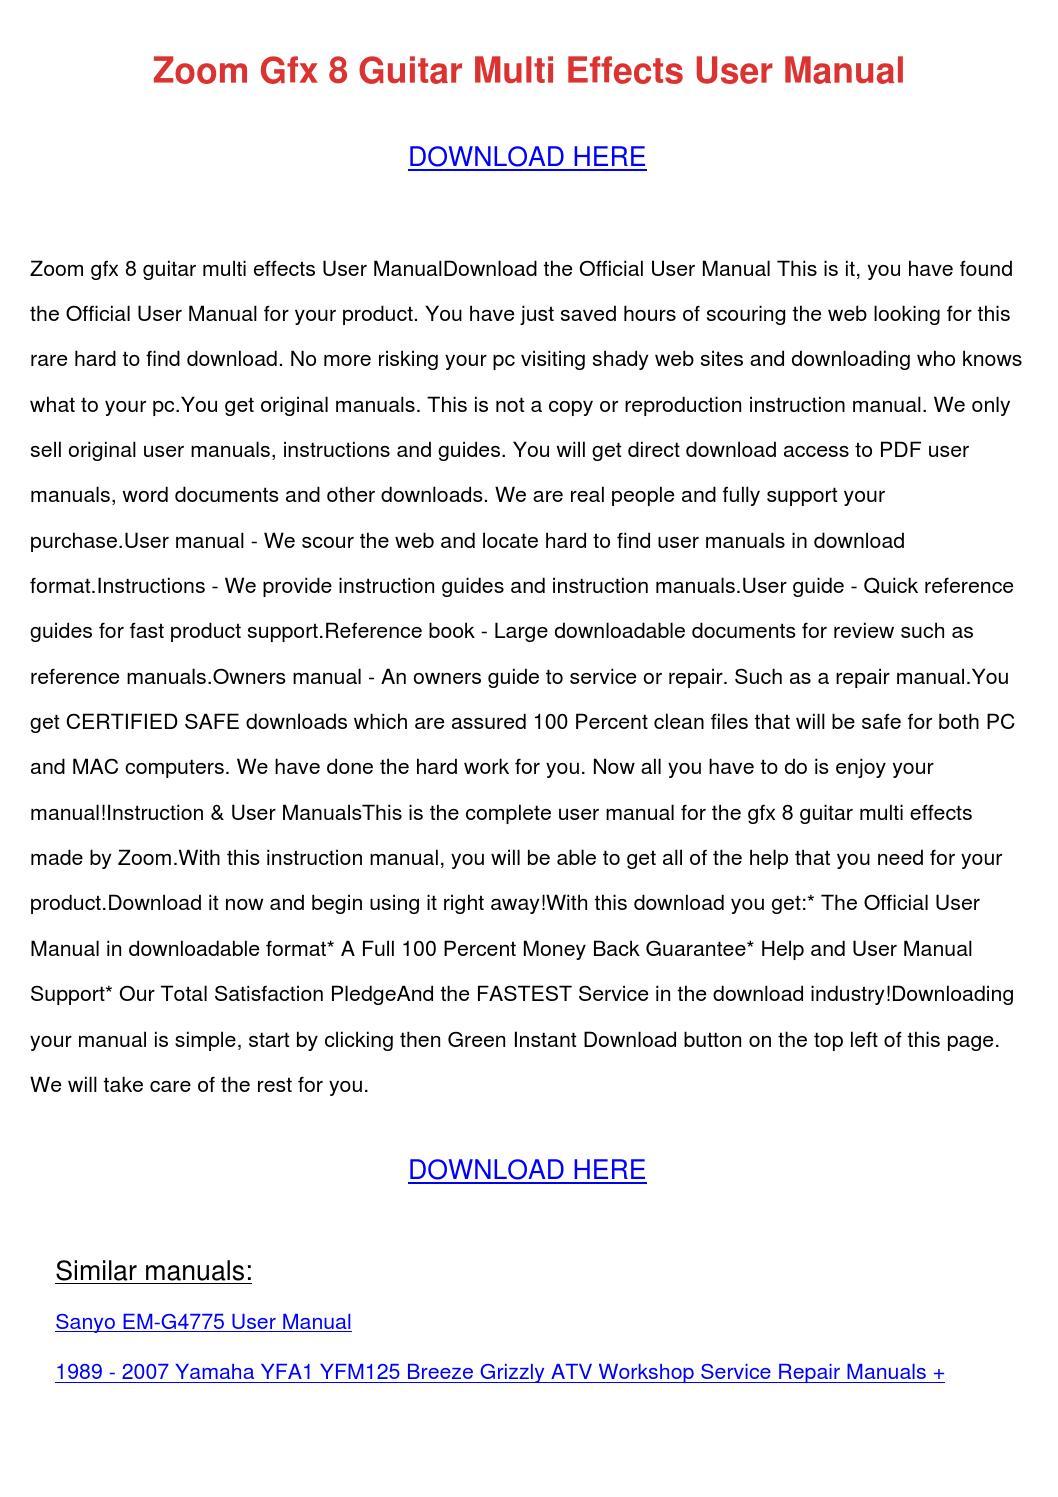 Zoom Gfx 8 Guitar Multi Effects User Manual by ReneePriest - issuu